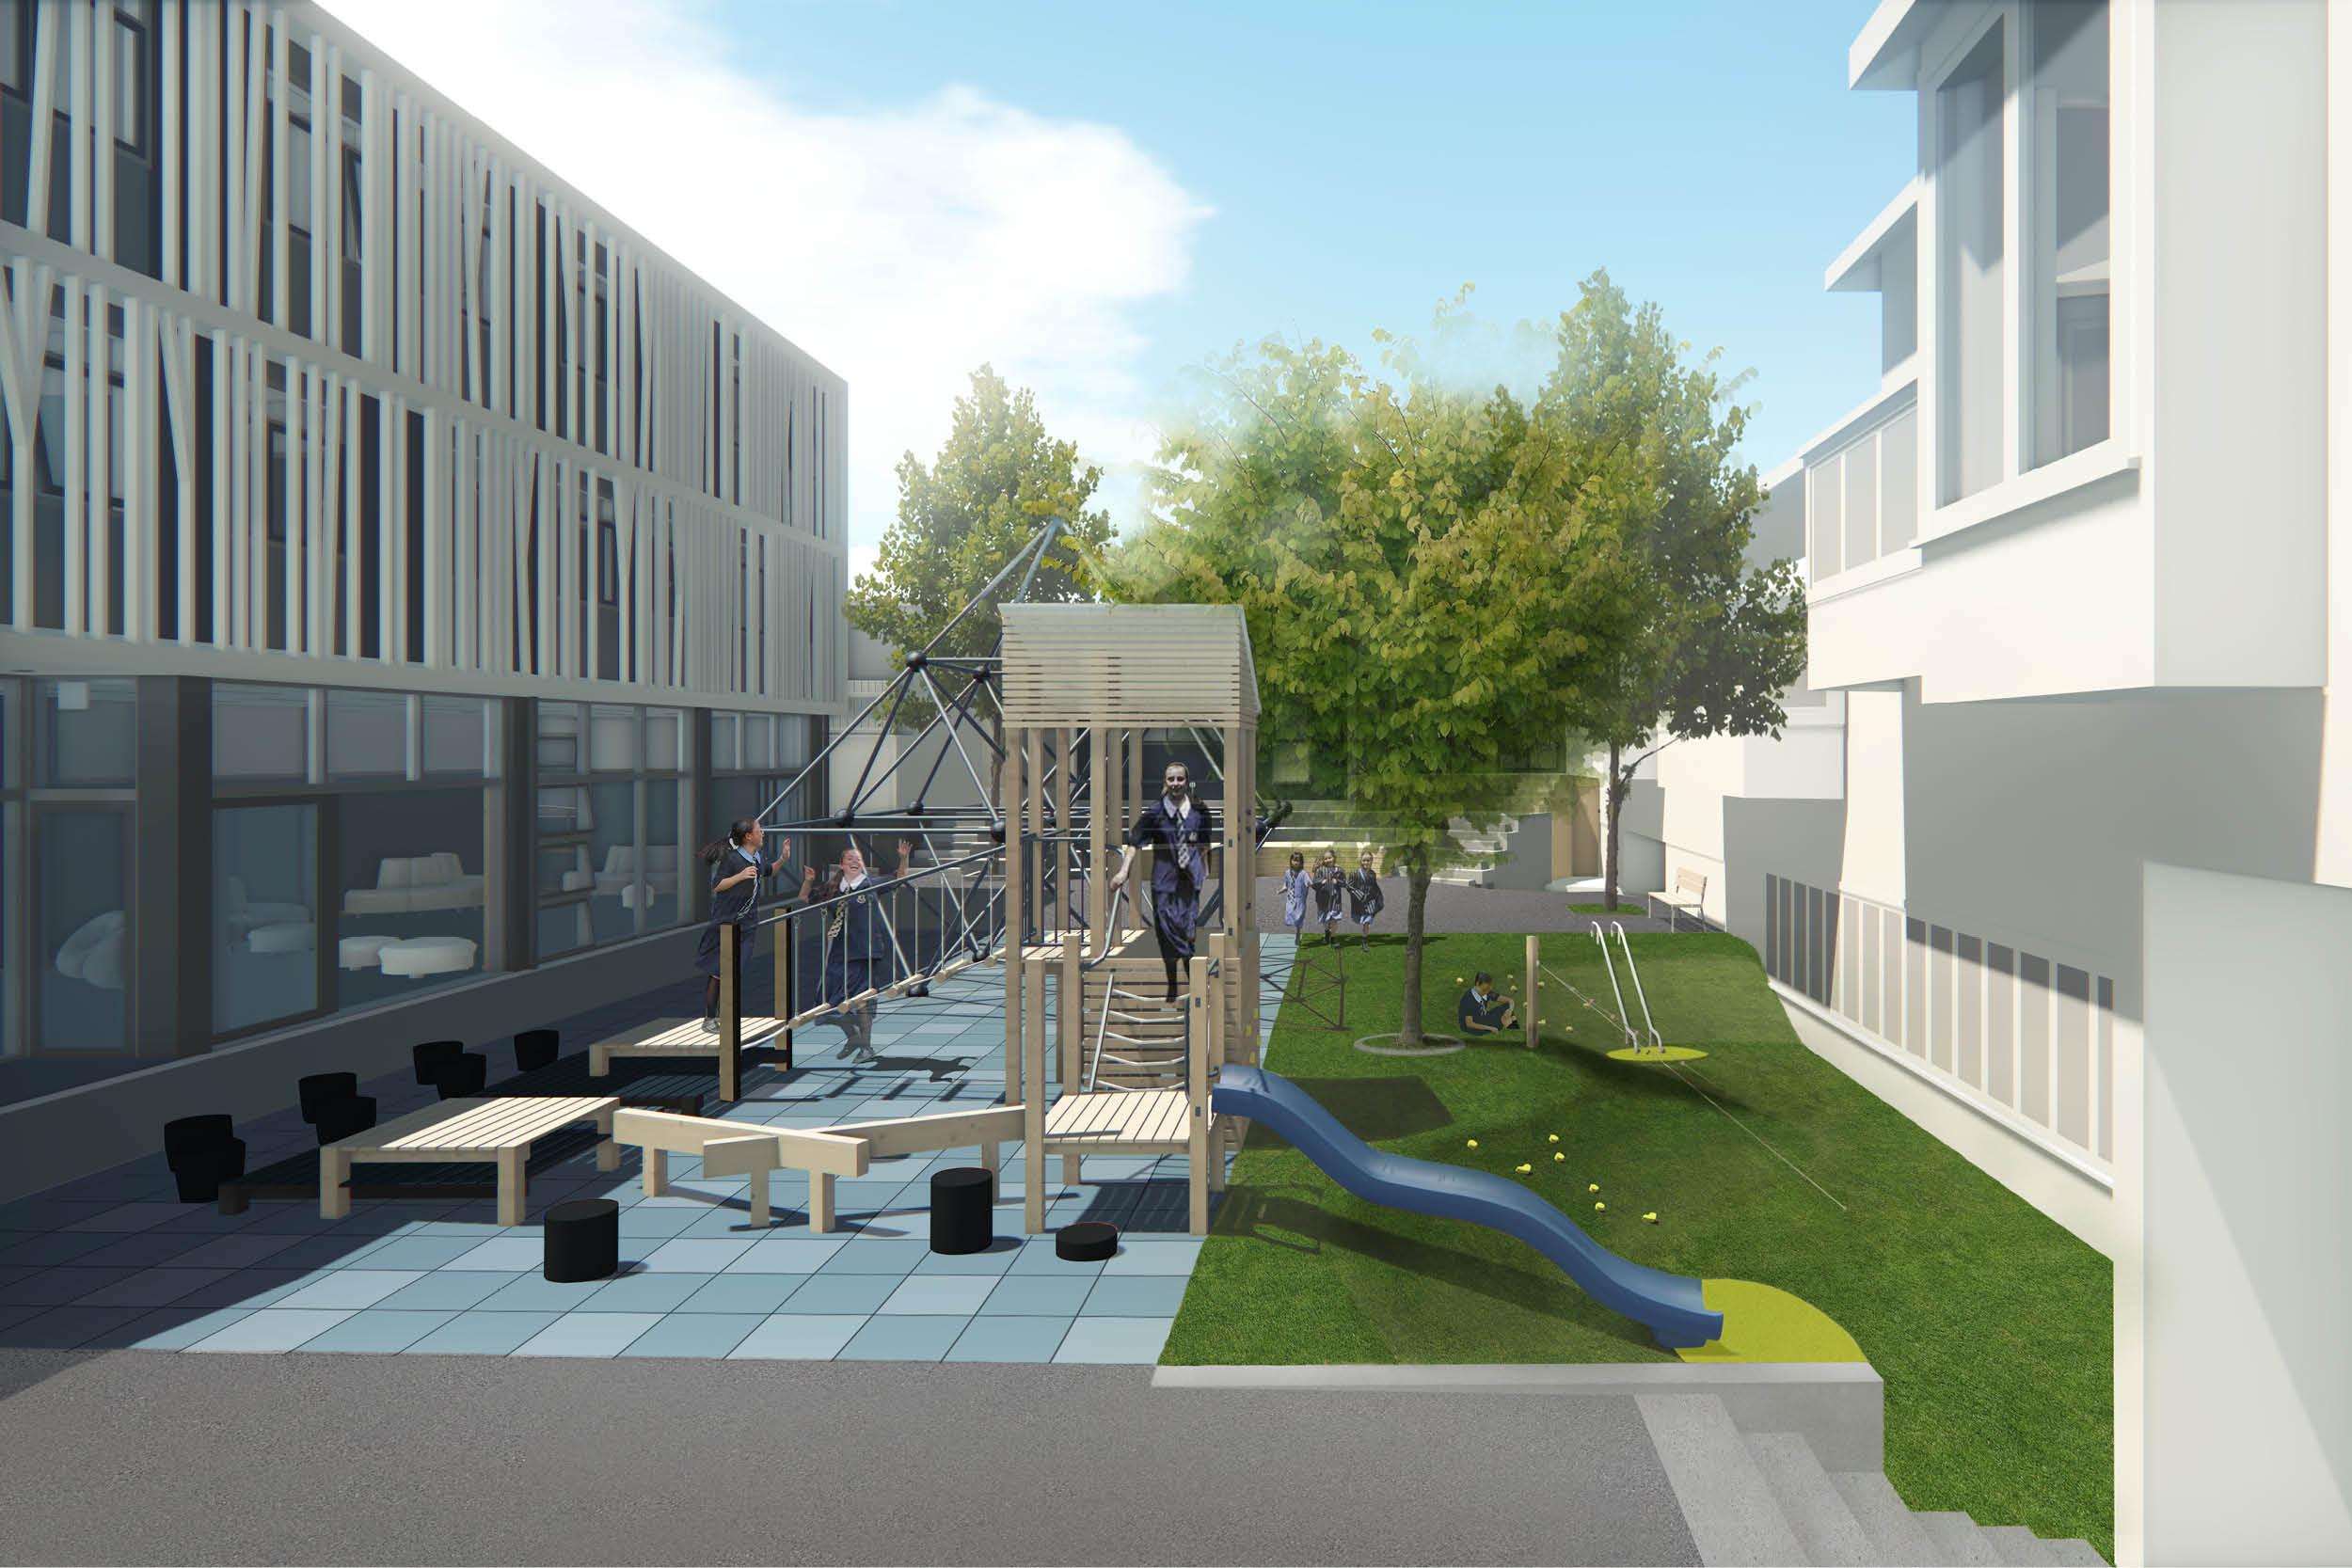 Courtyard_Playground_Urban_Educational_Landscape_Architecture.jpg